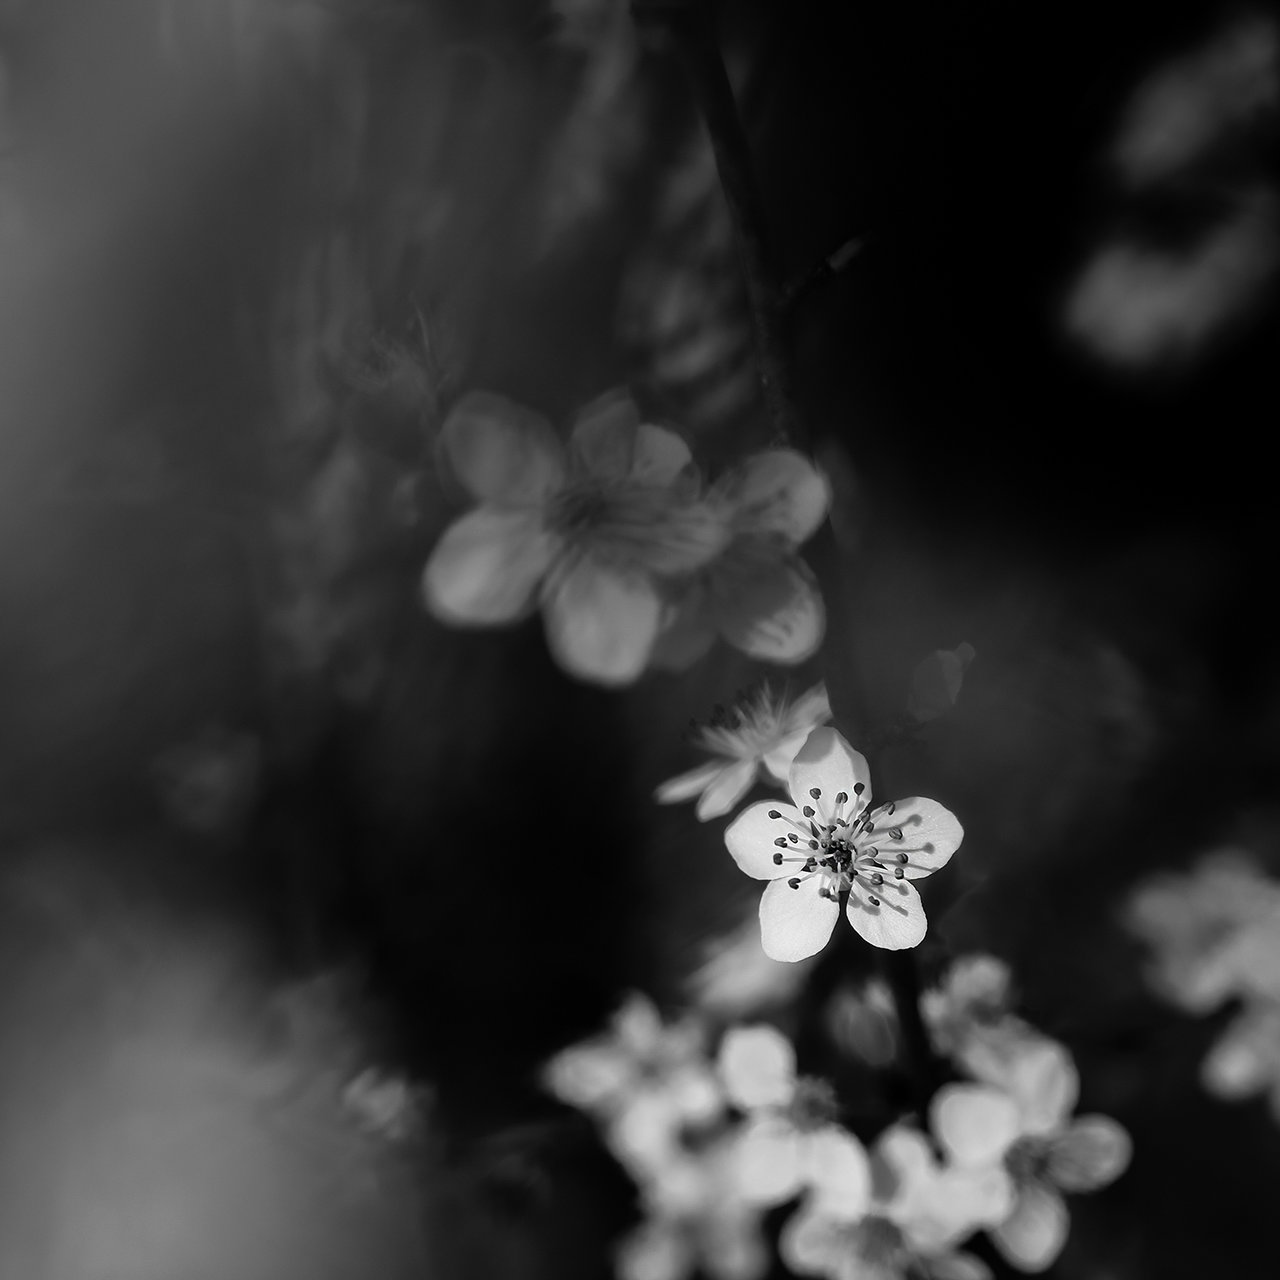 Spring Nocturne | Author Hristo Stefanov - ico10 | PHOTO FORUM